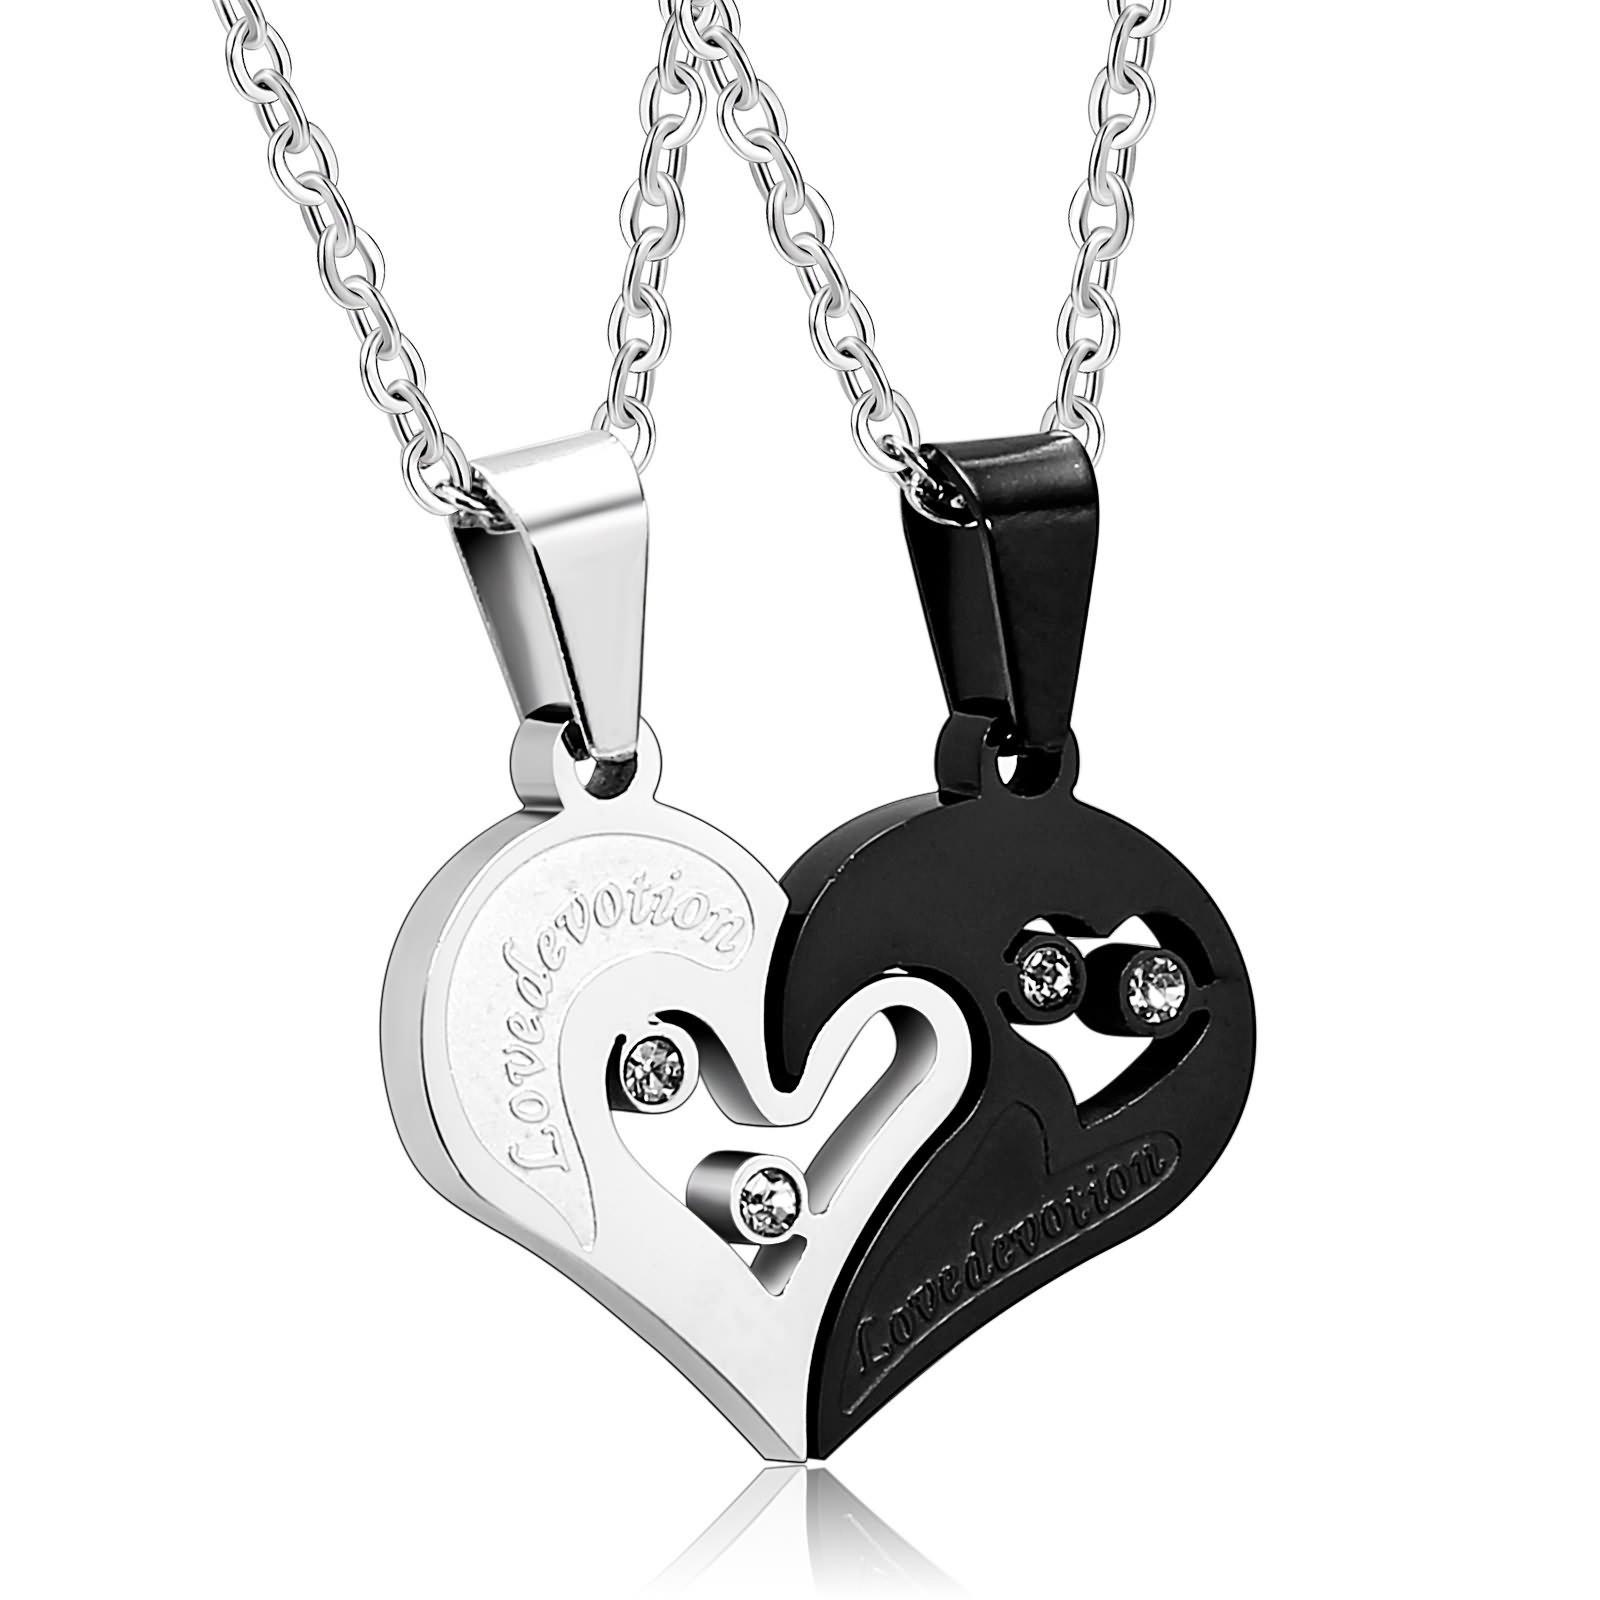 Beydodo Couple Necklace Love Heart Puzzle I Love You Black Silver CZ Mens Necklace Pendant